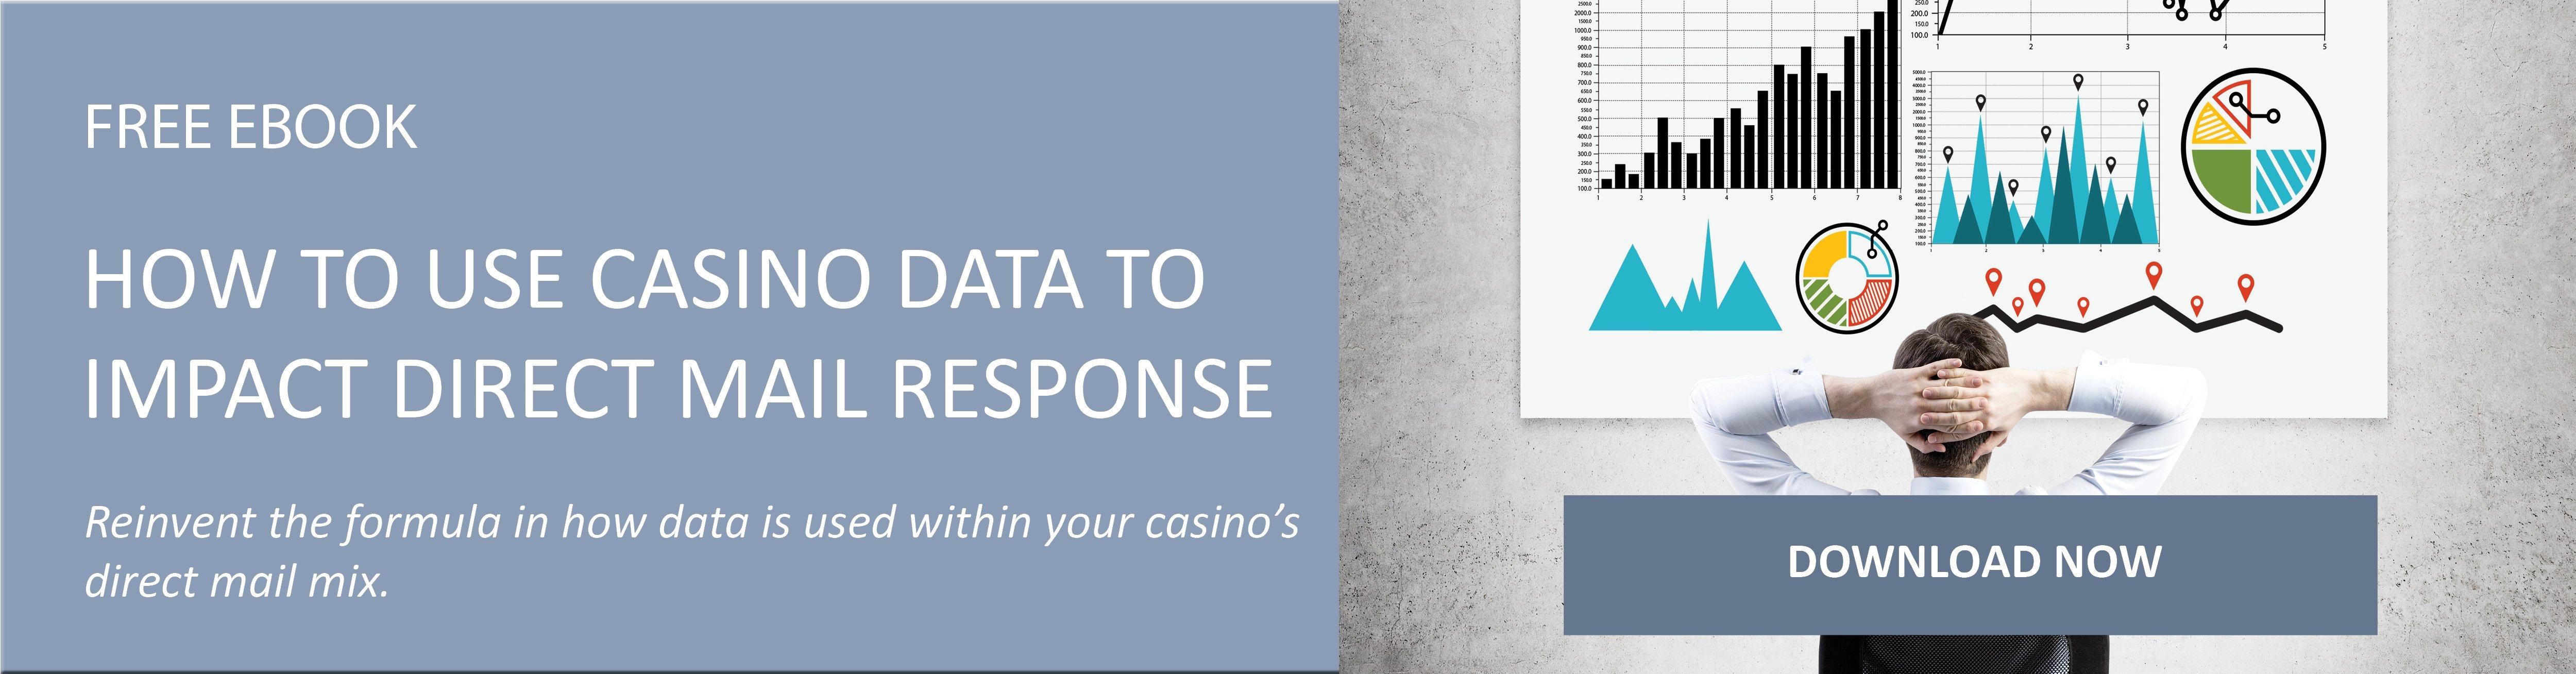 CTA-casino-ebook